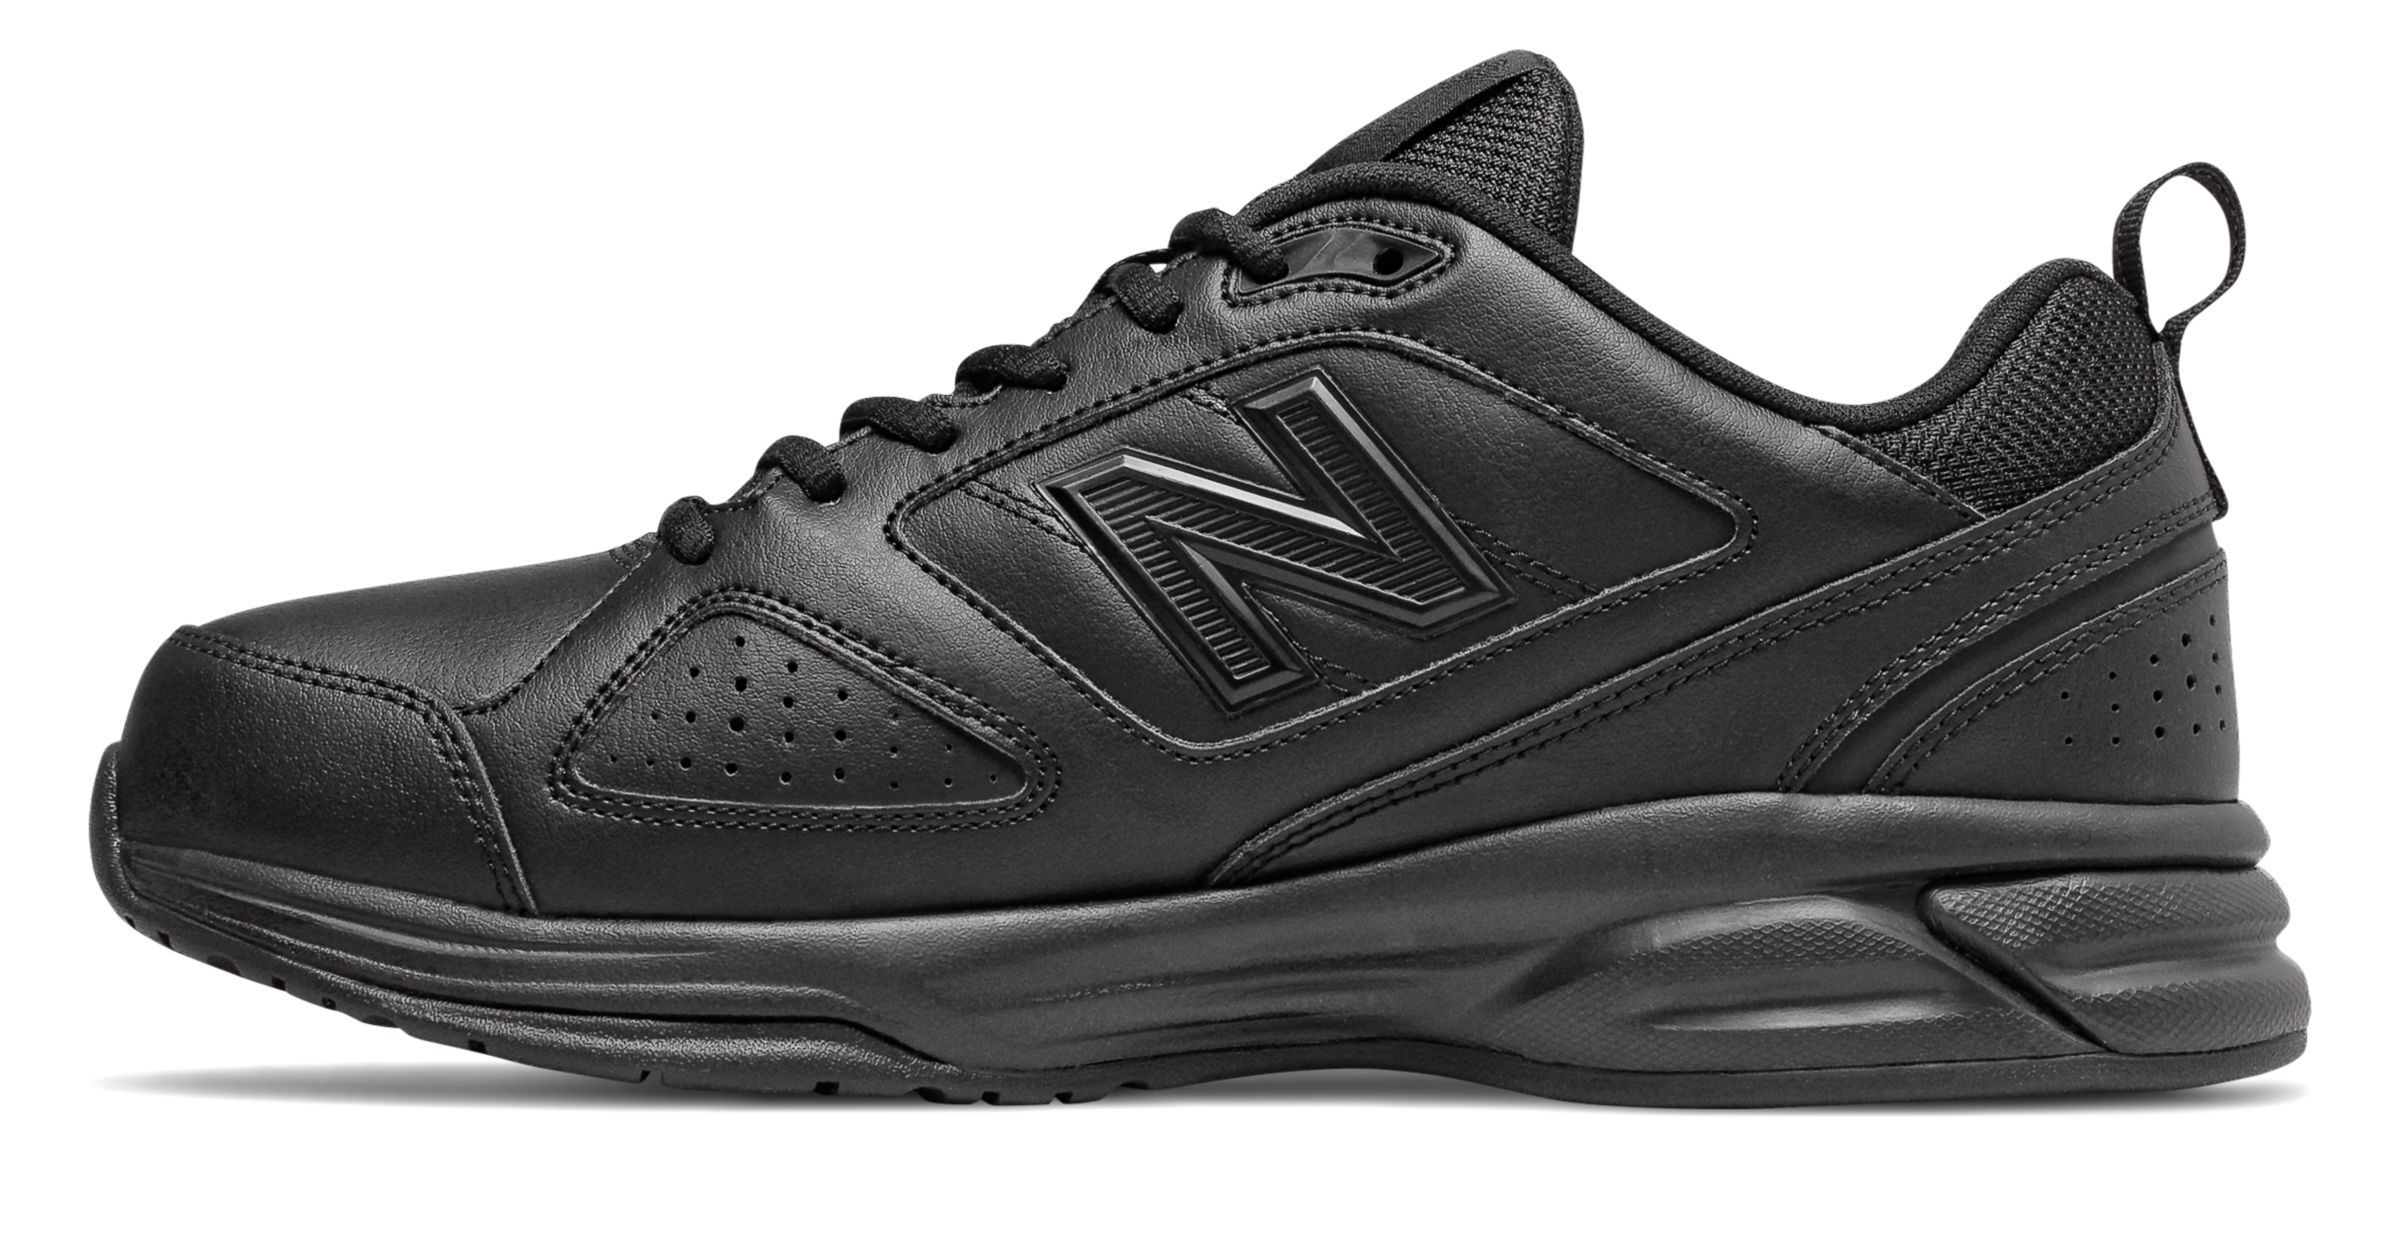 thumbnail 9 - New Balance 624v4 Leather Men's Running Running Training Shoes